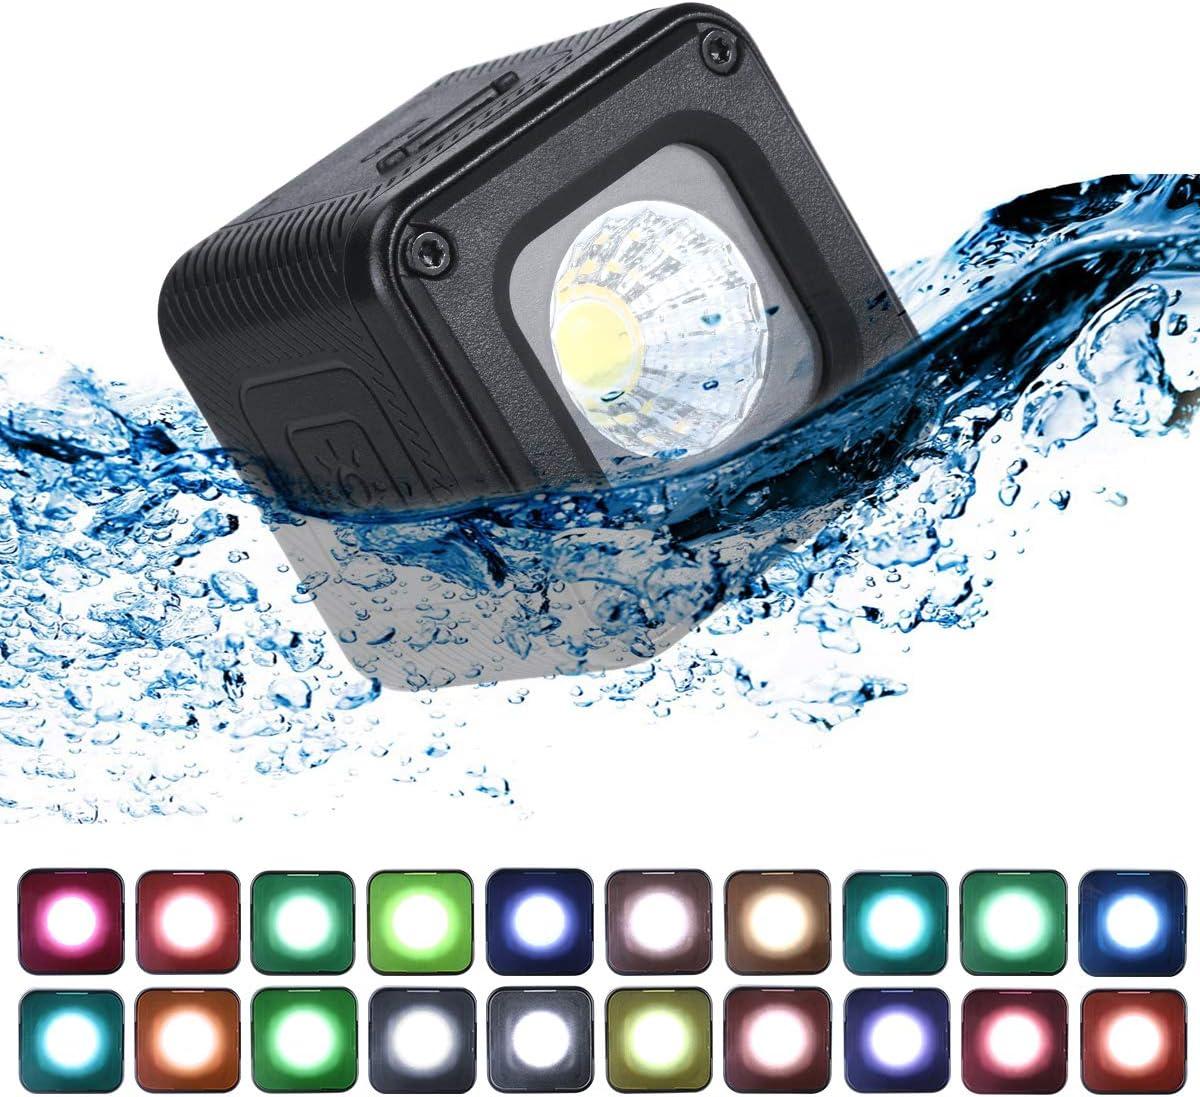 ULANZI L1 Pro Mini LED إضاءة مقاومة للماء مع 20 لون جل لكاميرا الهواتف الذكية بدون طيار التصوير الفوتوغرافي والفيديو، تحت الماء، متوافقة مع كاميرا دي جي اي او اس مو اكشن جوبرو 8 7 6 5 iPhone DSLR